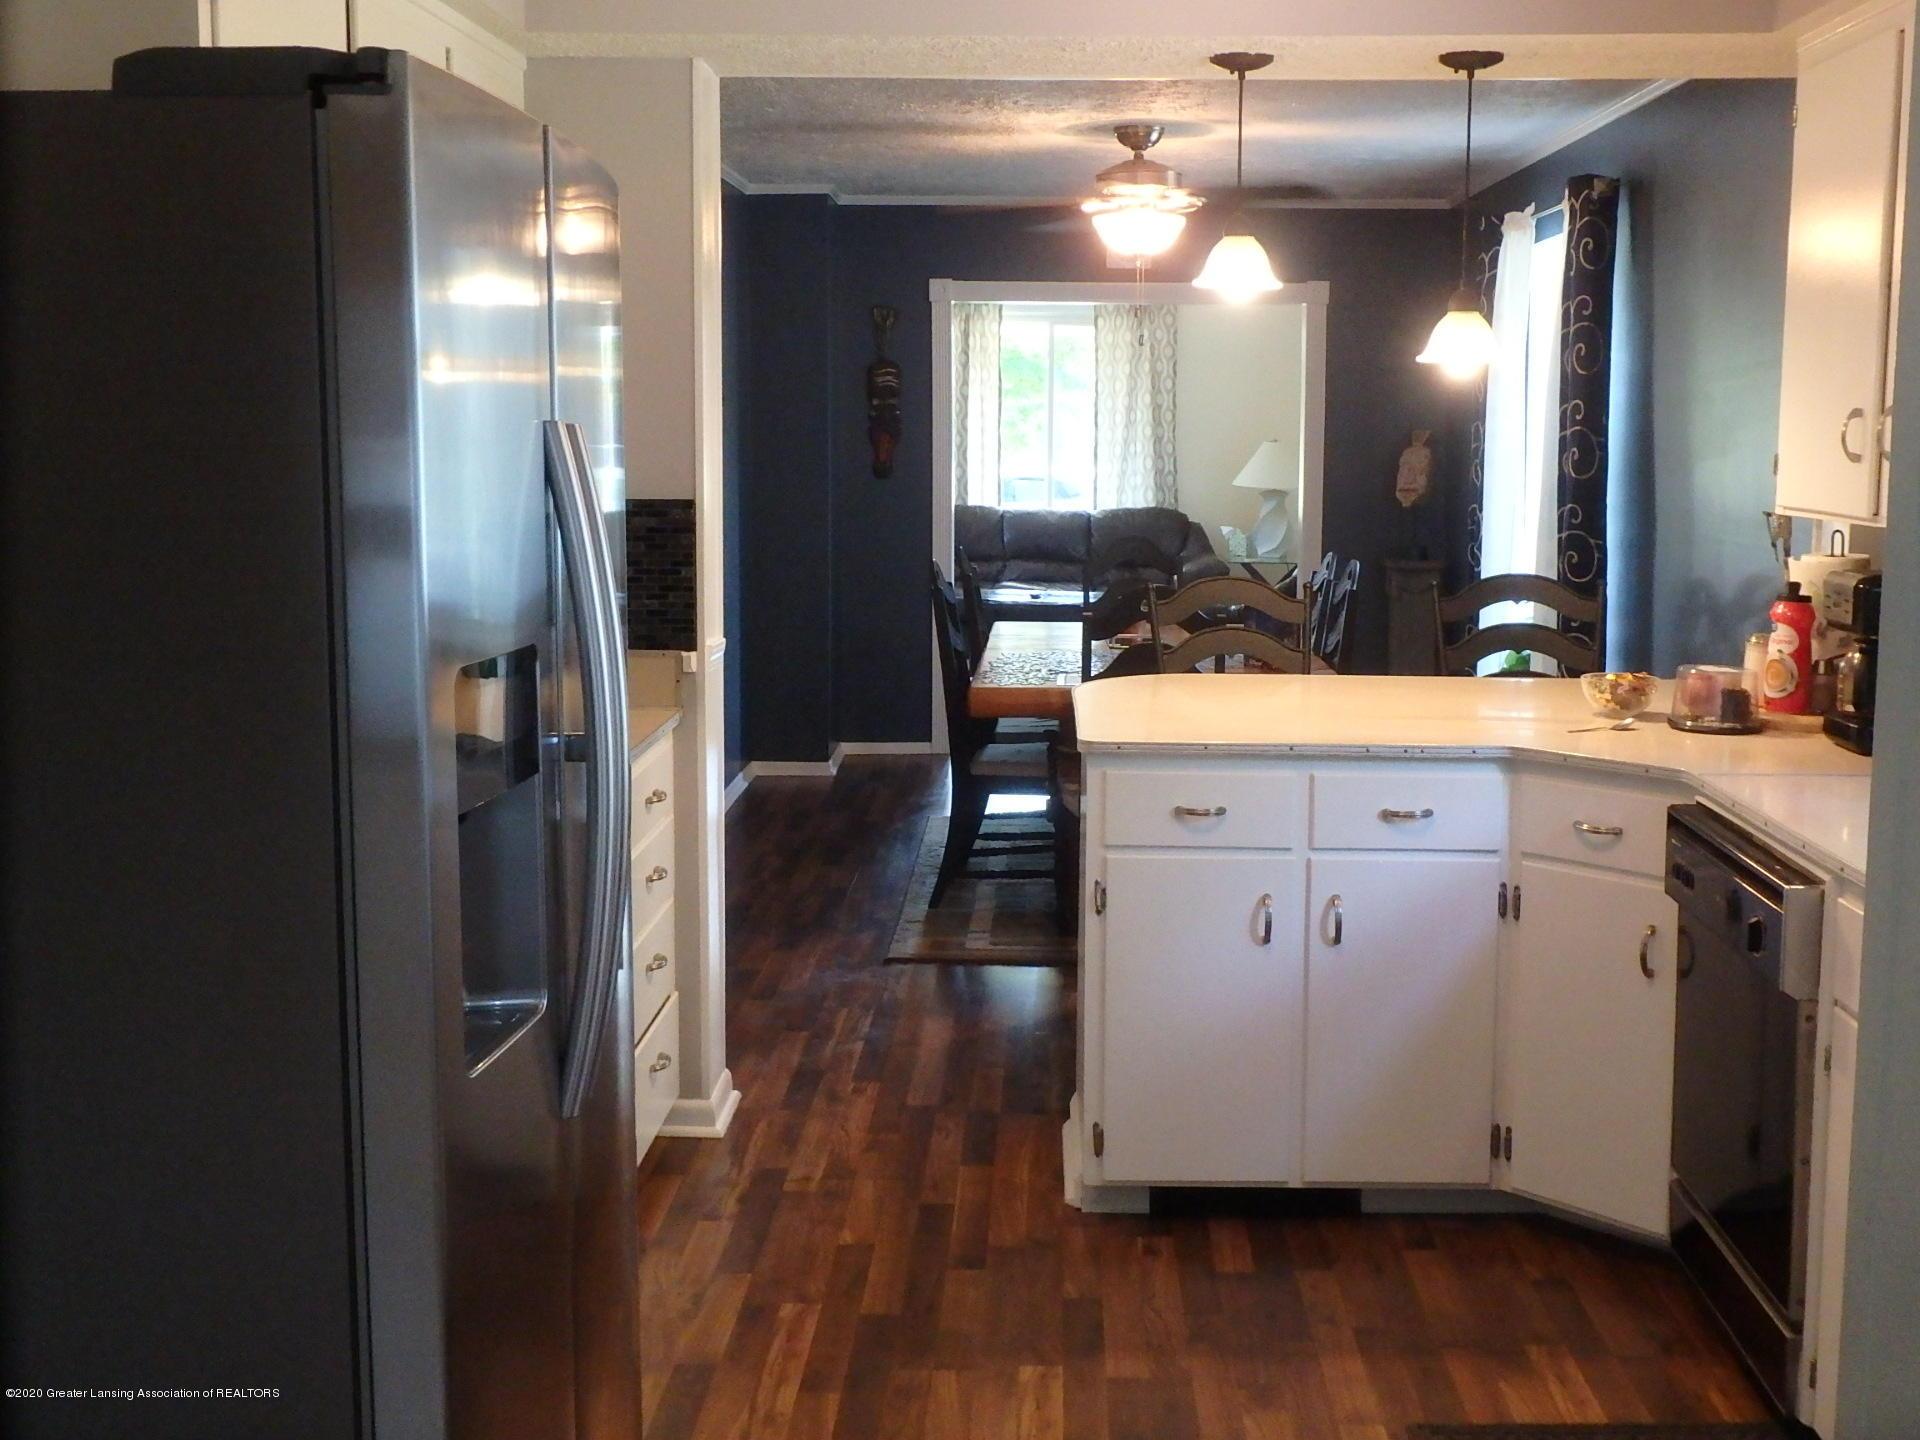 315 Pleasant St - 315 kitchen - 2